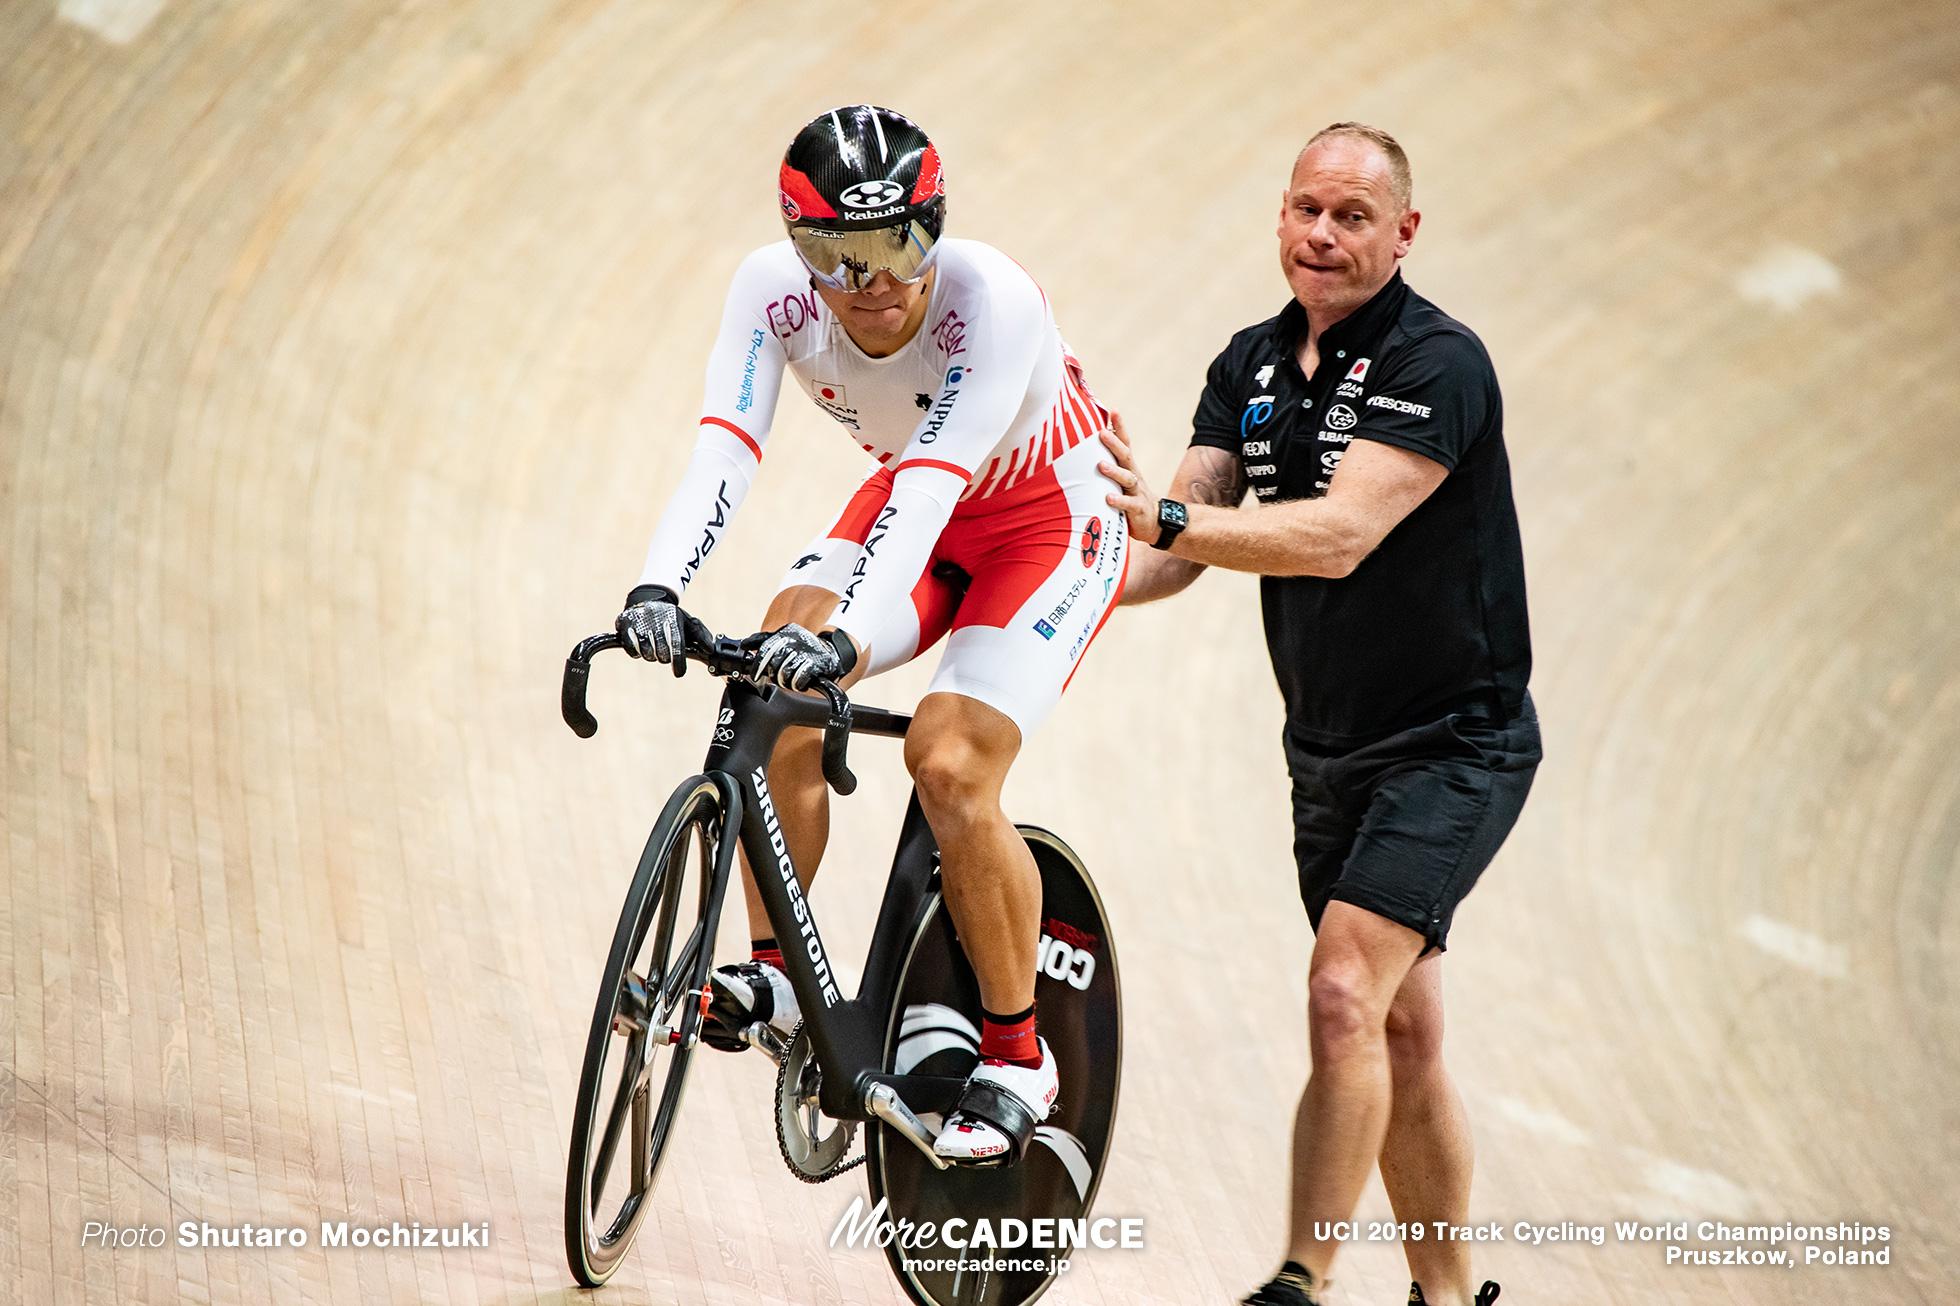 Men's Keirin 1st Round / 2019 Track Cycling World Championships Pruszków, Poland